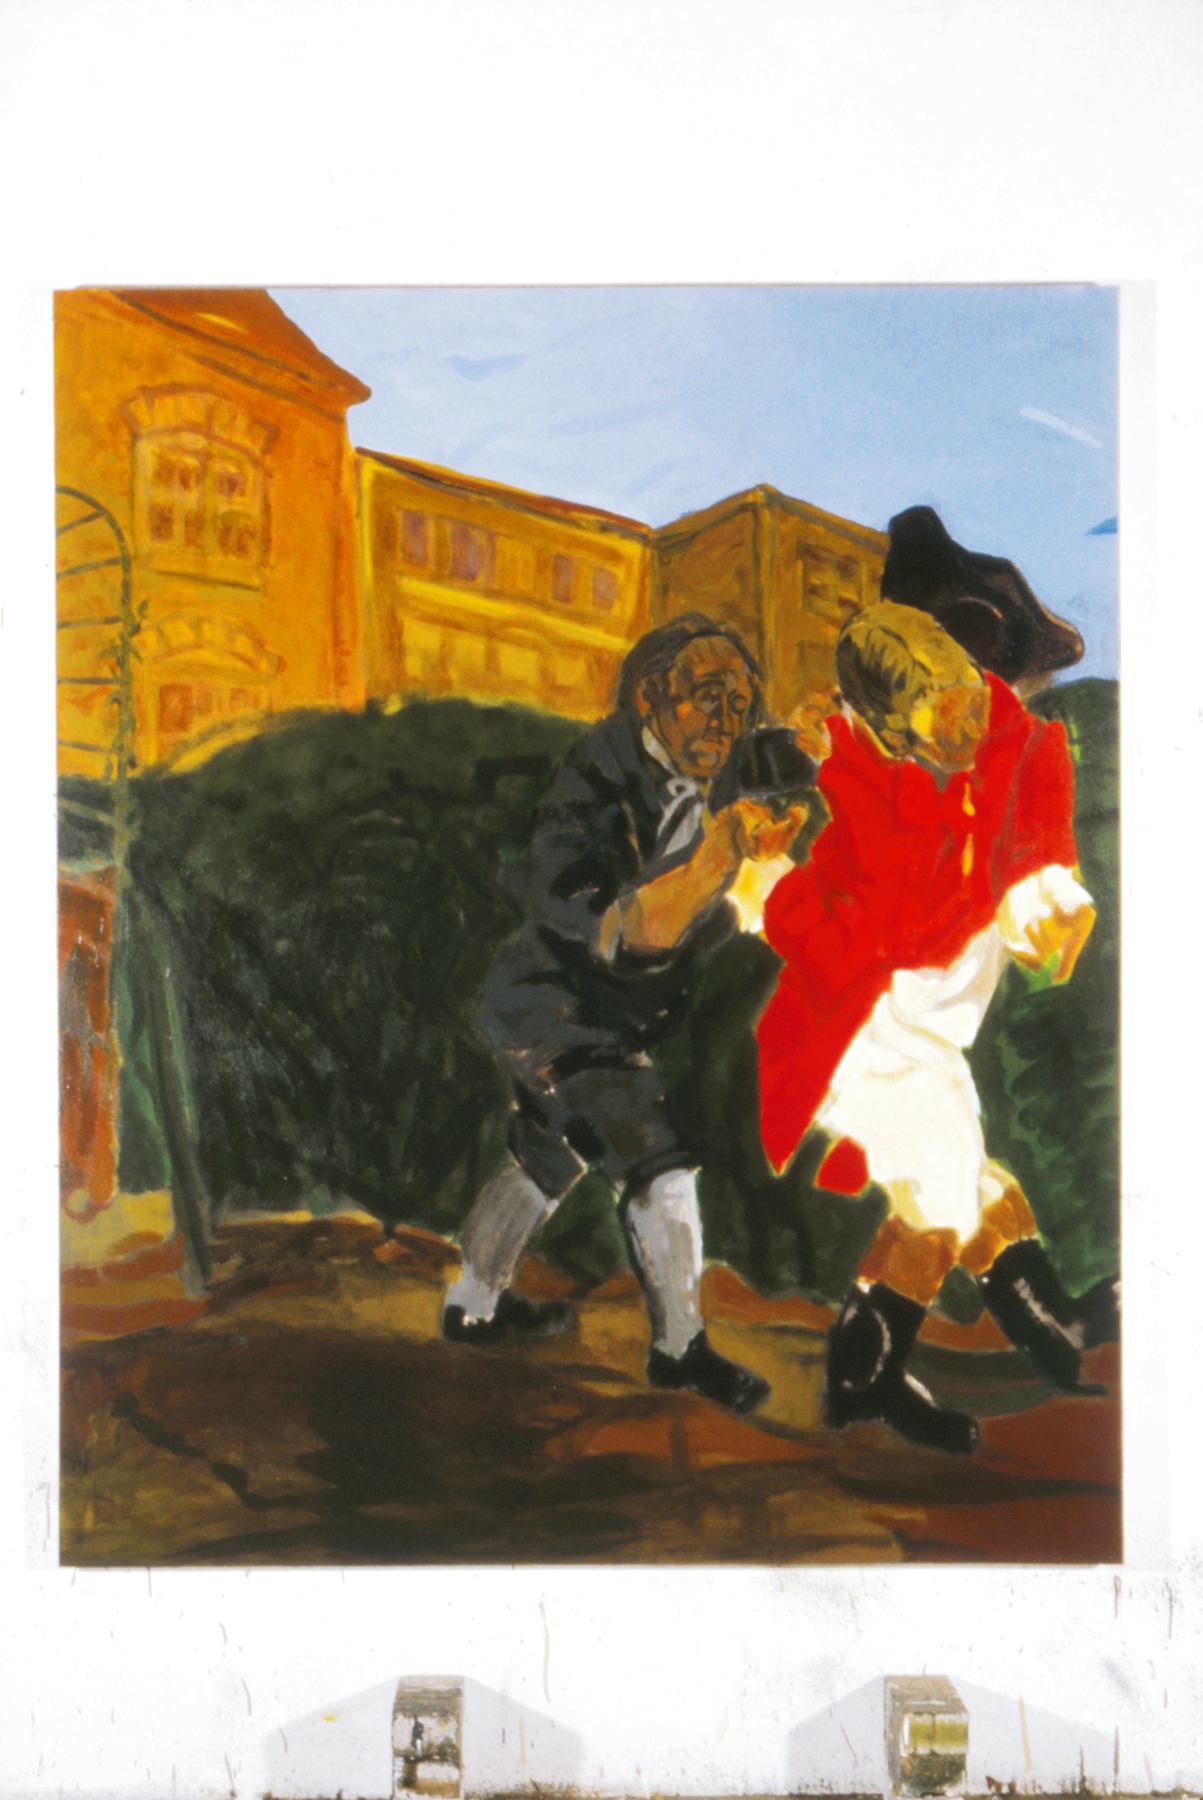 The active physiognomy: Blake at Felpham, Aug. 12, 1803